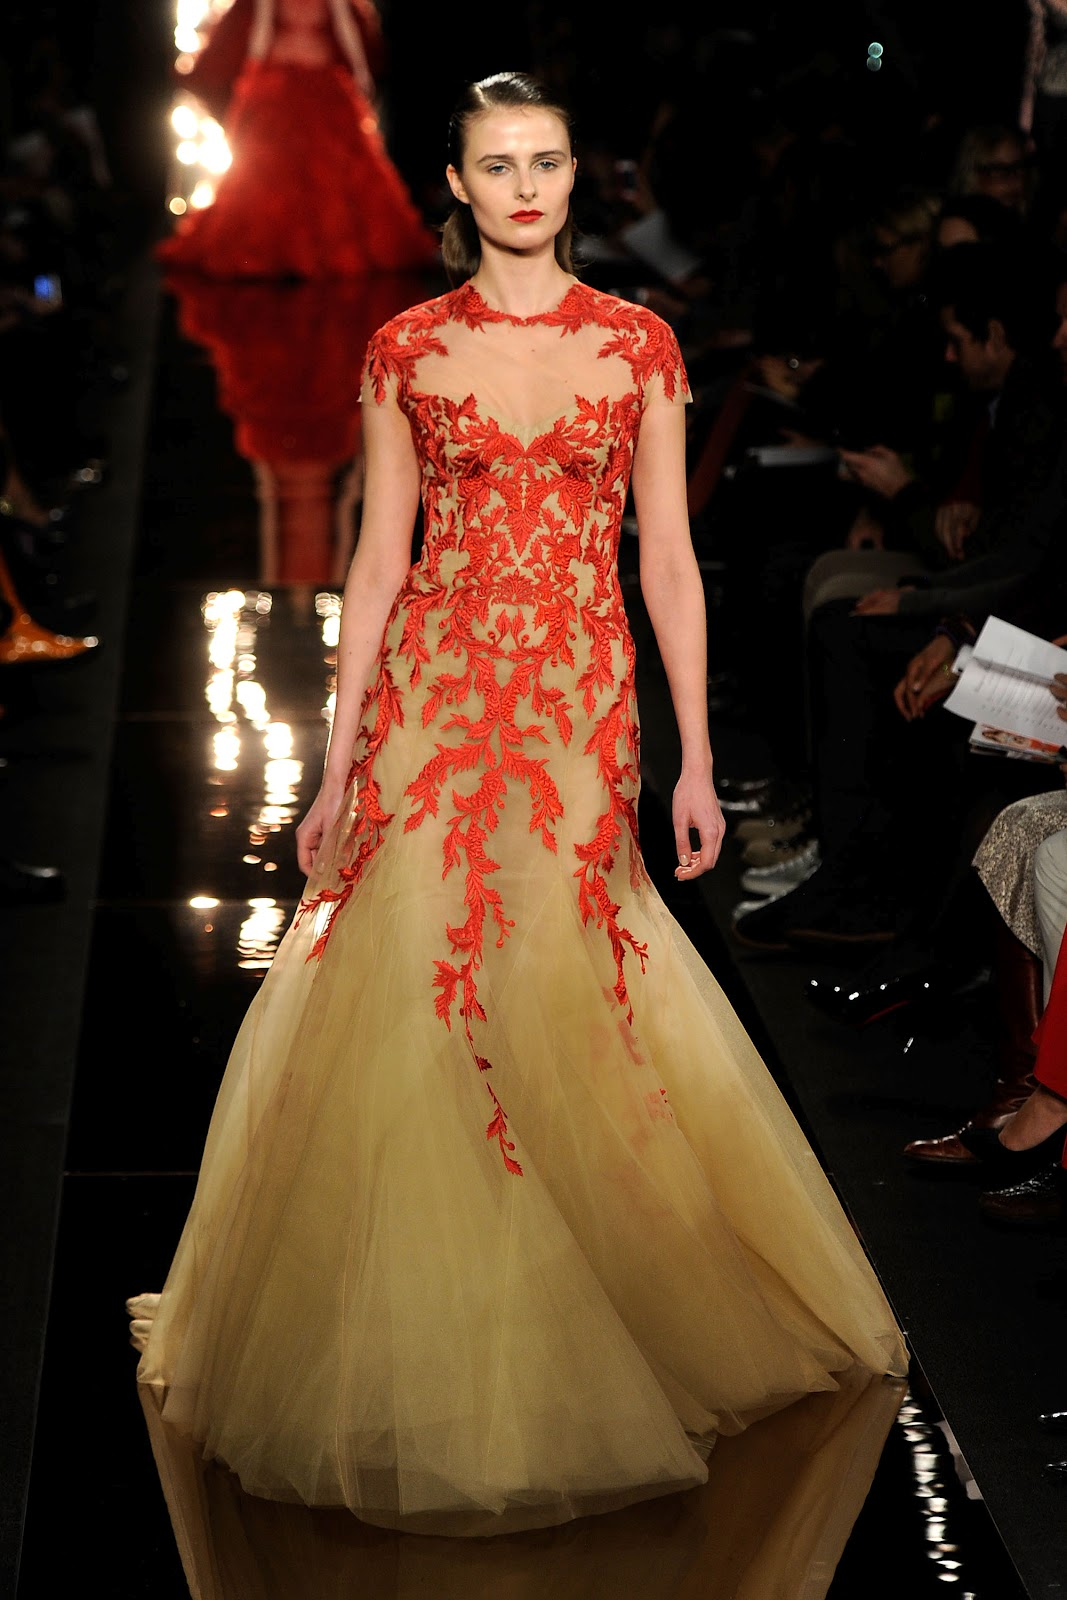 http://4.bp.blogspot.com/-B2h_pV28Q3c/Tzfm_IpmT5I/AAAAAAAAEkE/ymip8AWaKvo/s1600/Monique+Lhuillier+New+York+Fashion+Wek+Fall+2012.jpg